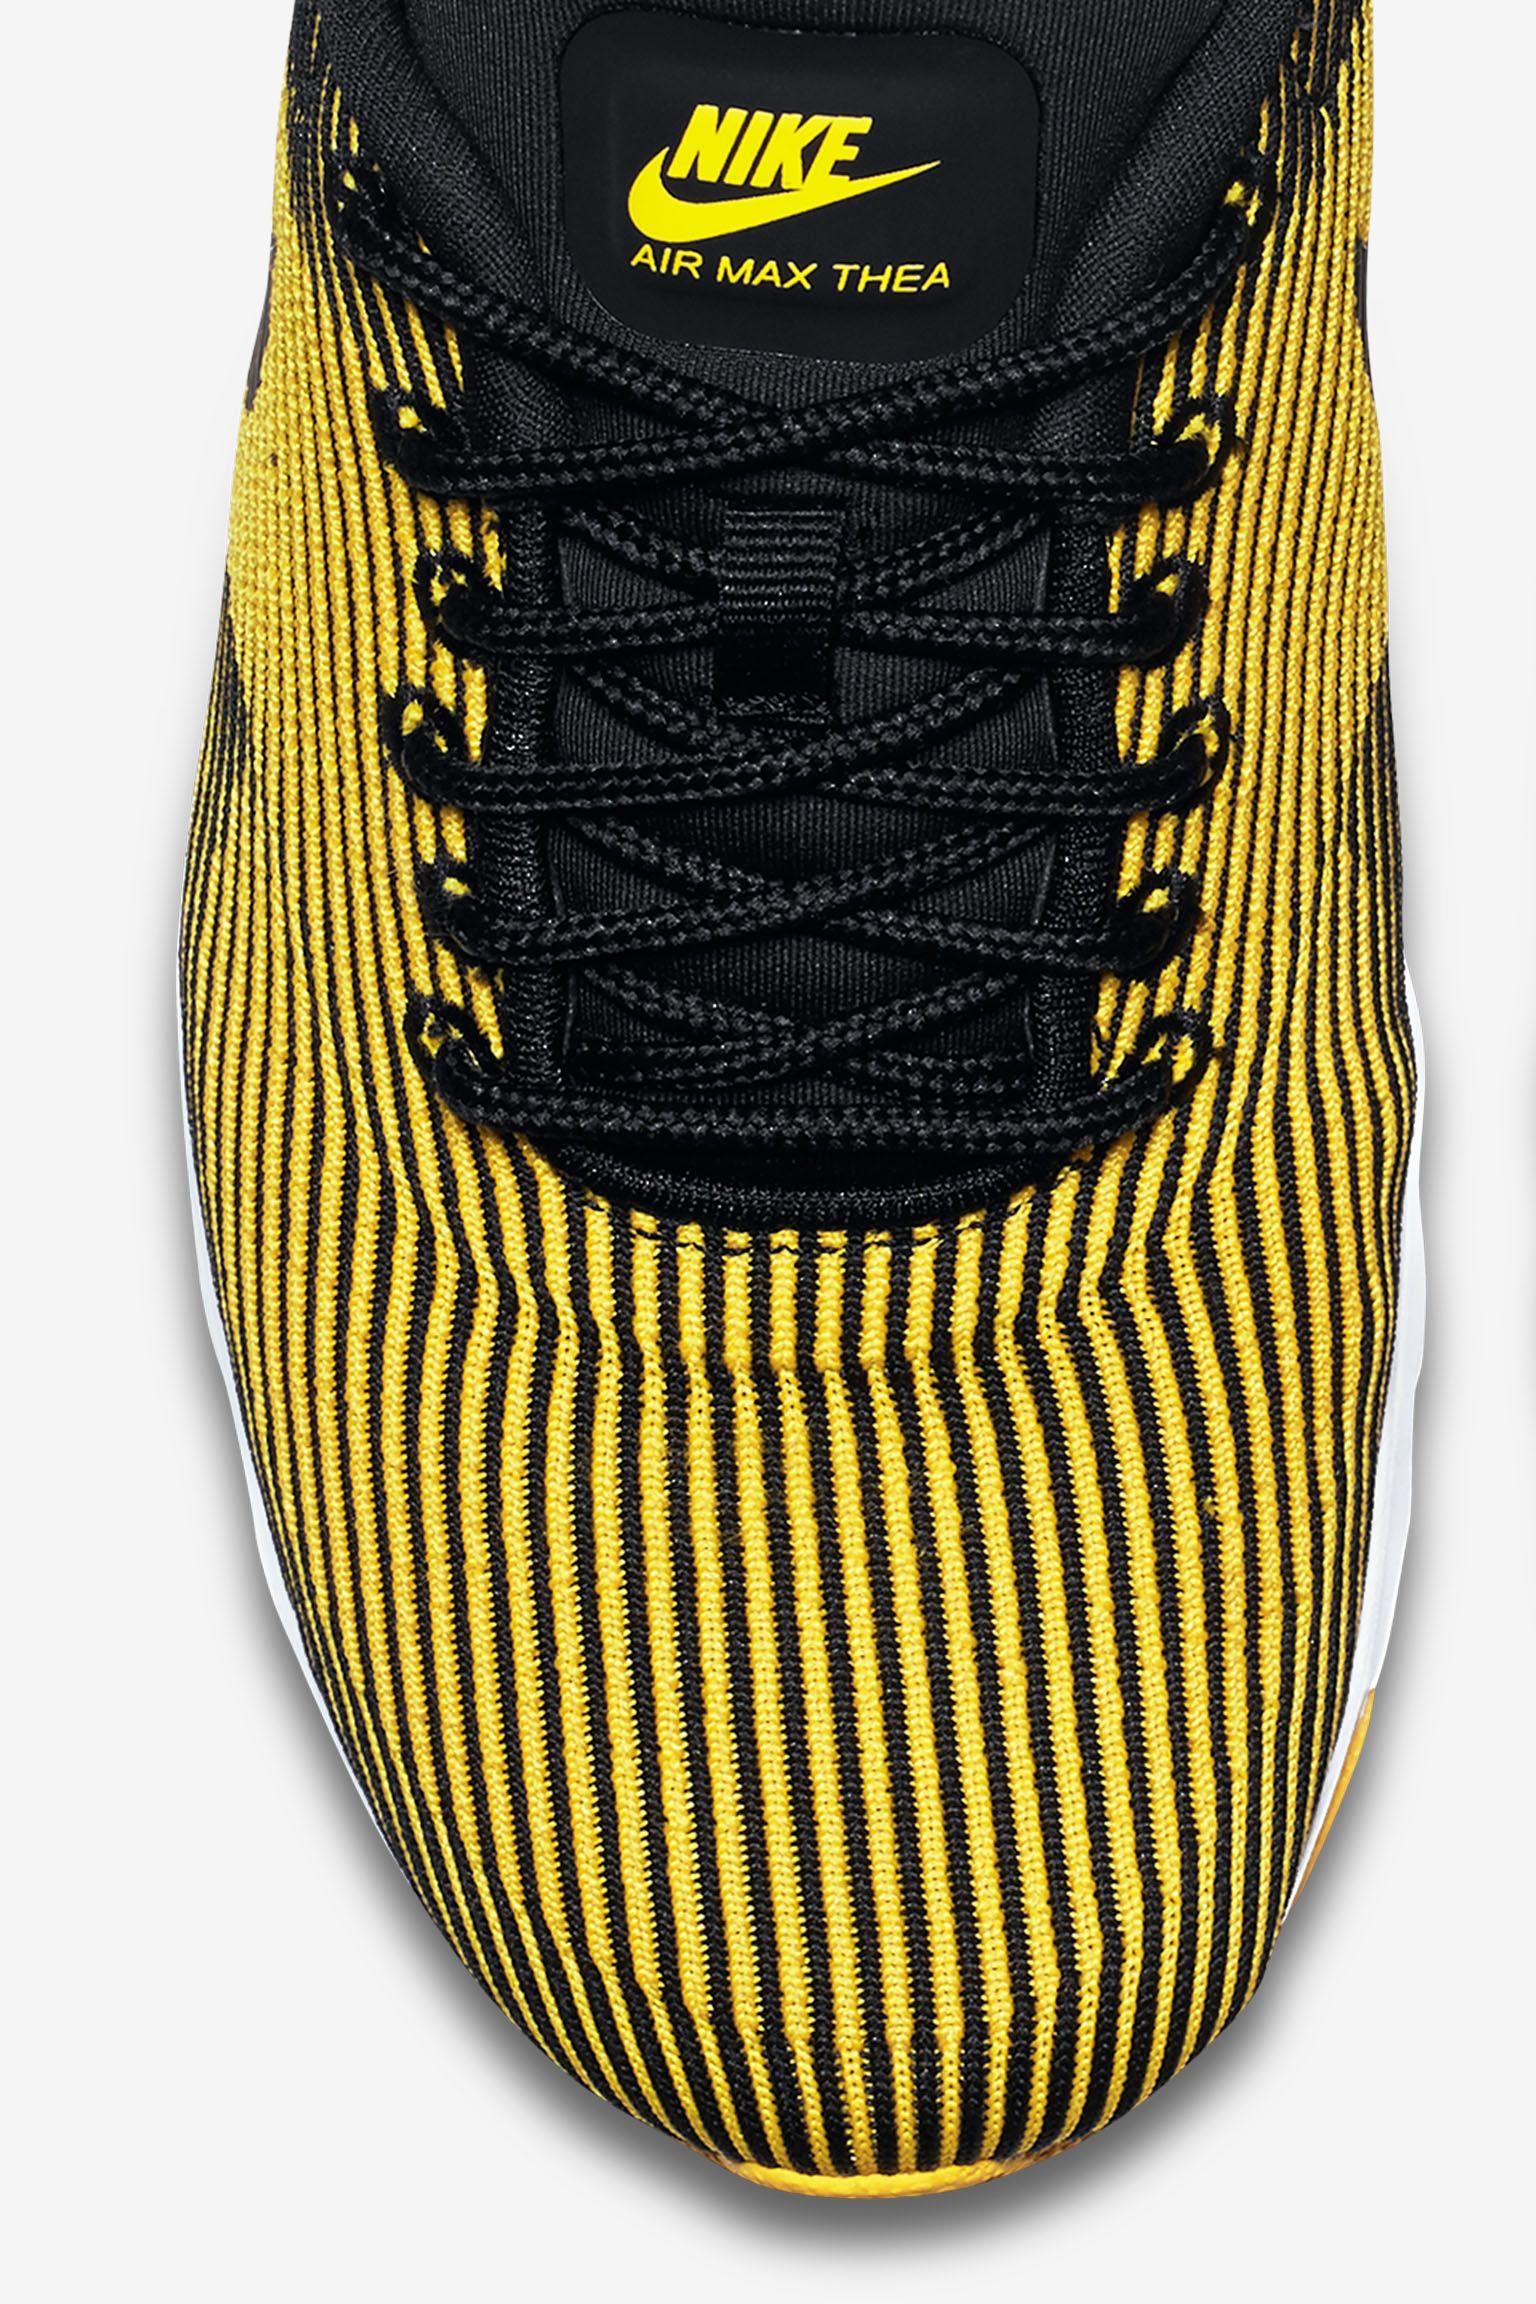 Women's Nike Air Max Thea Jacquard 'Varsity Maize & Black'